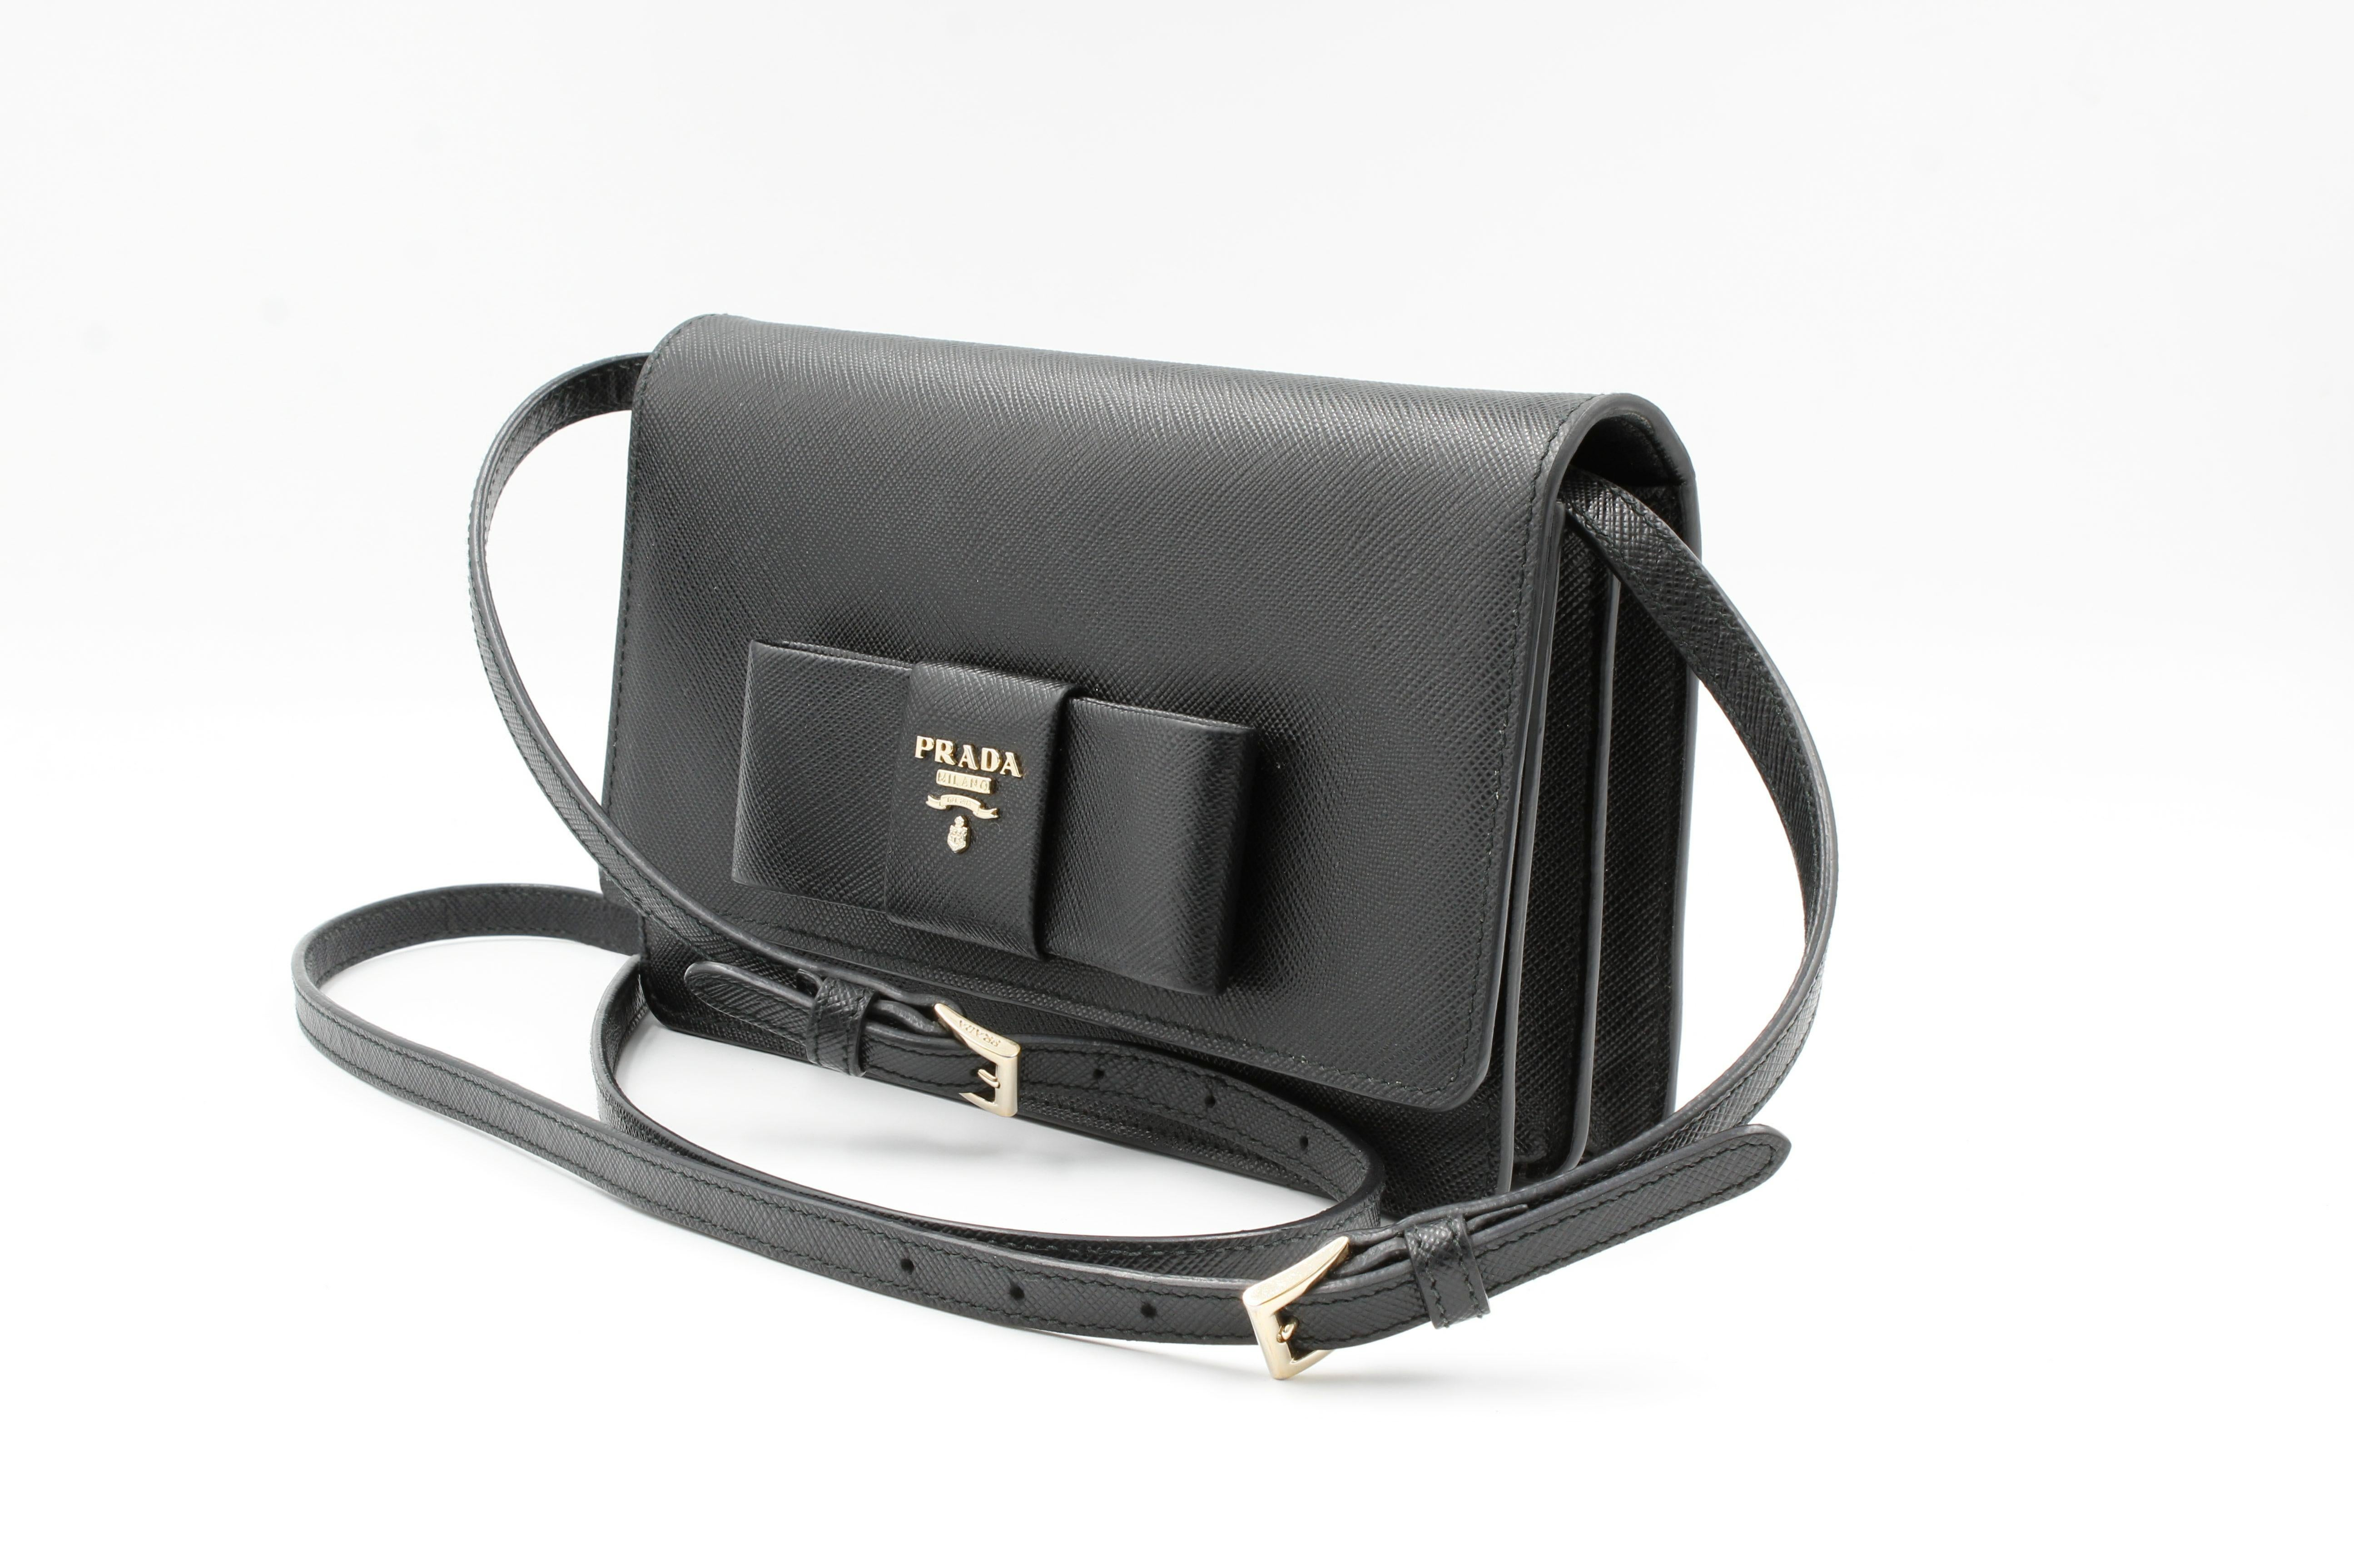 d0422820 Prada Saffiano Galleria Black Leather Cross body Ladies Bag 1BH009 F0002